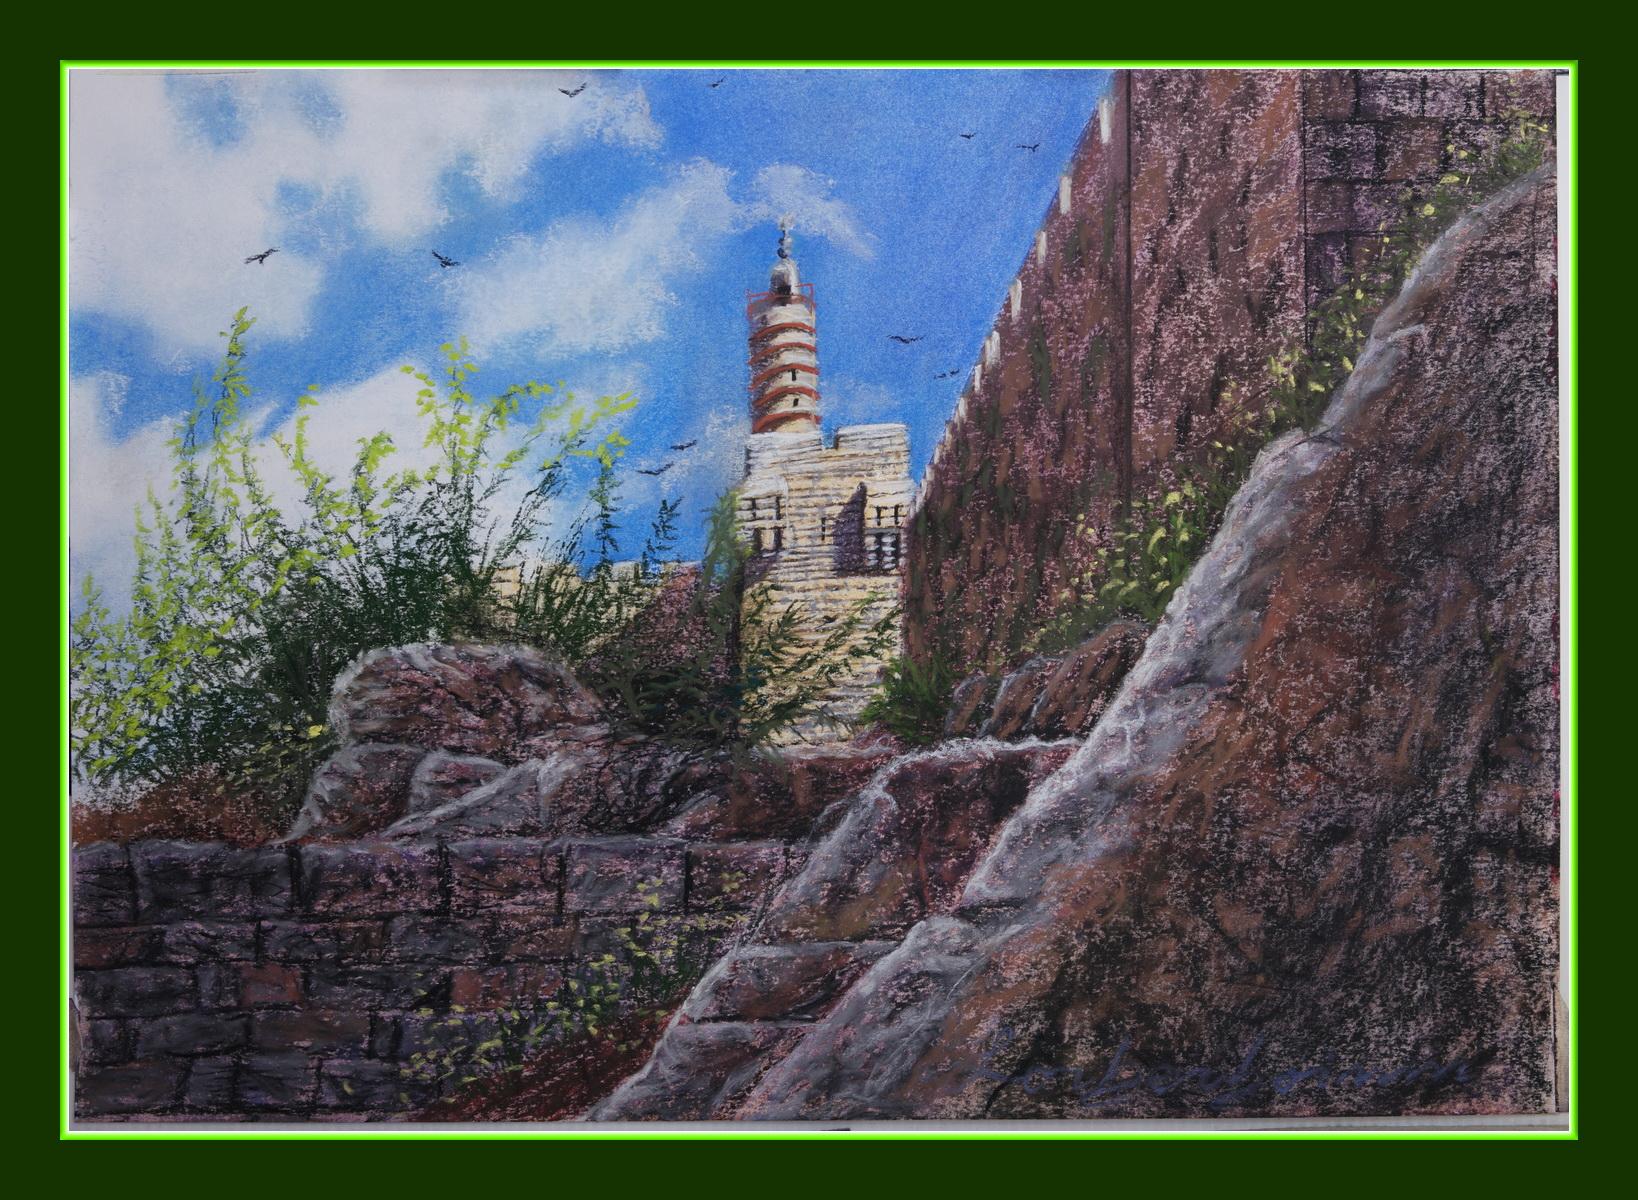 Tower of David, Jerusalem. Lorberboim Soft Pastel Painting. New View Exhibitiom. Tlmuseum.com.